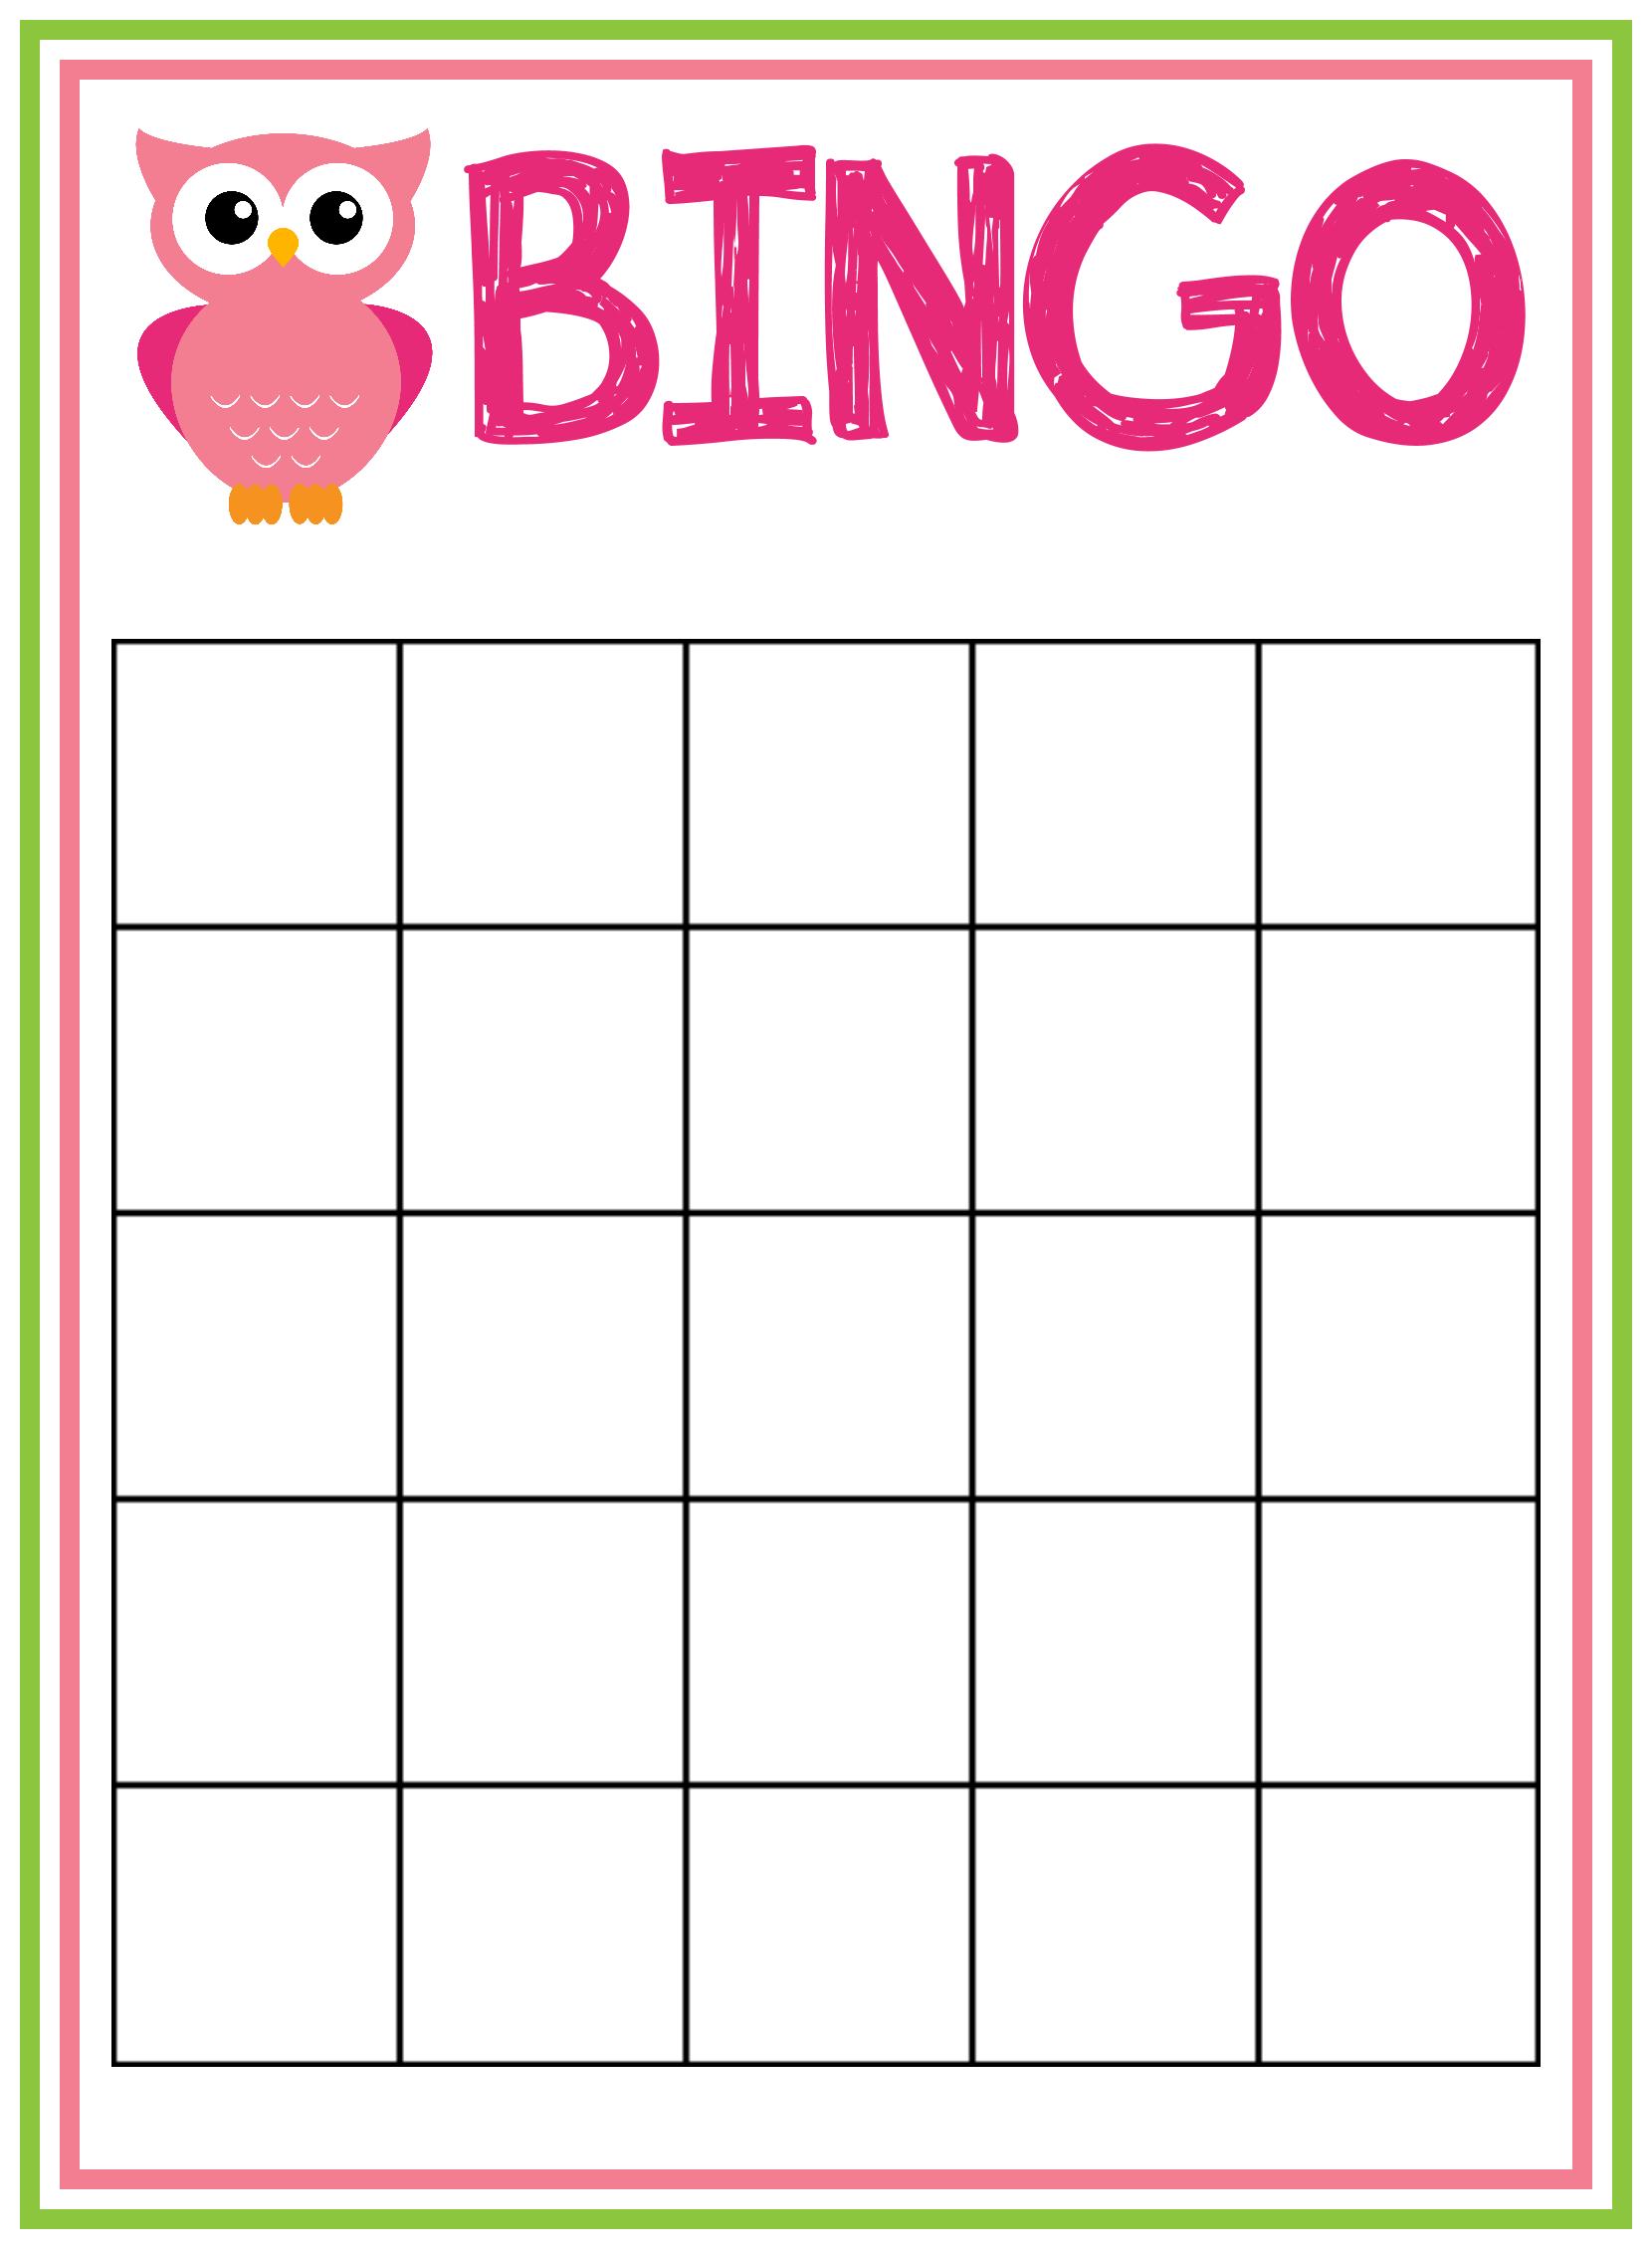 see printable baby shower bingo words list free printable baby shower